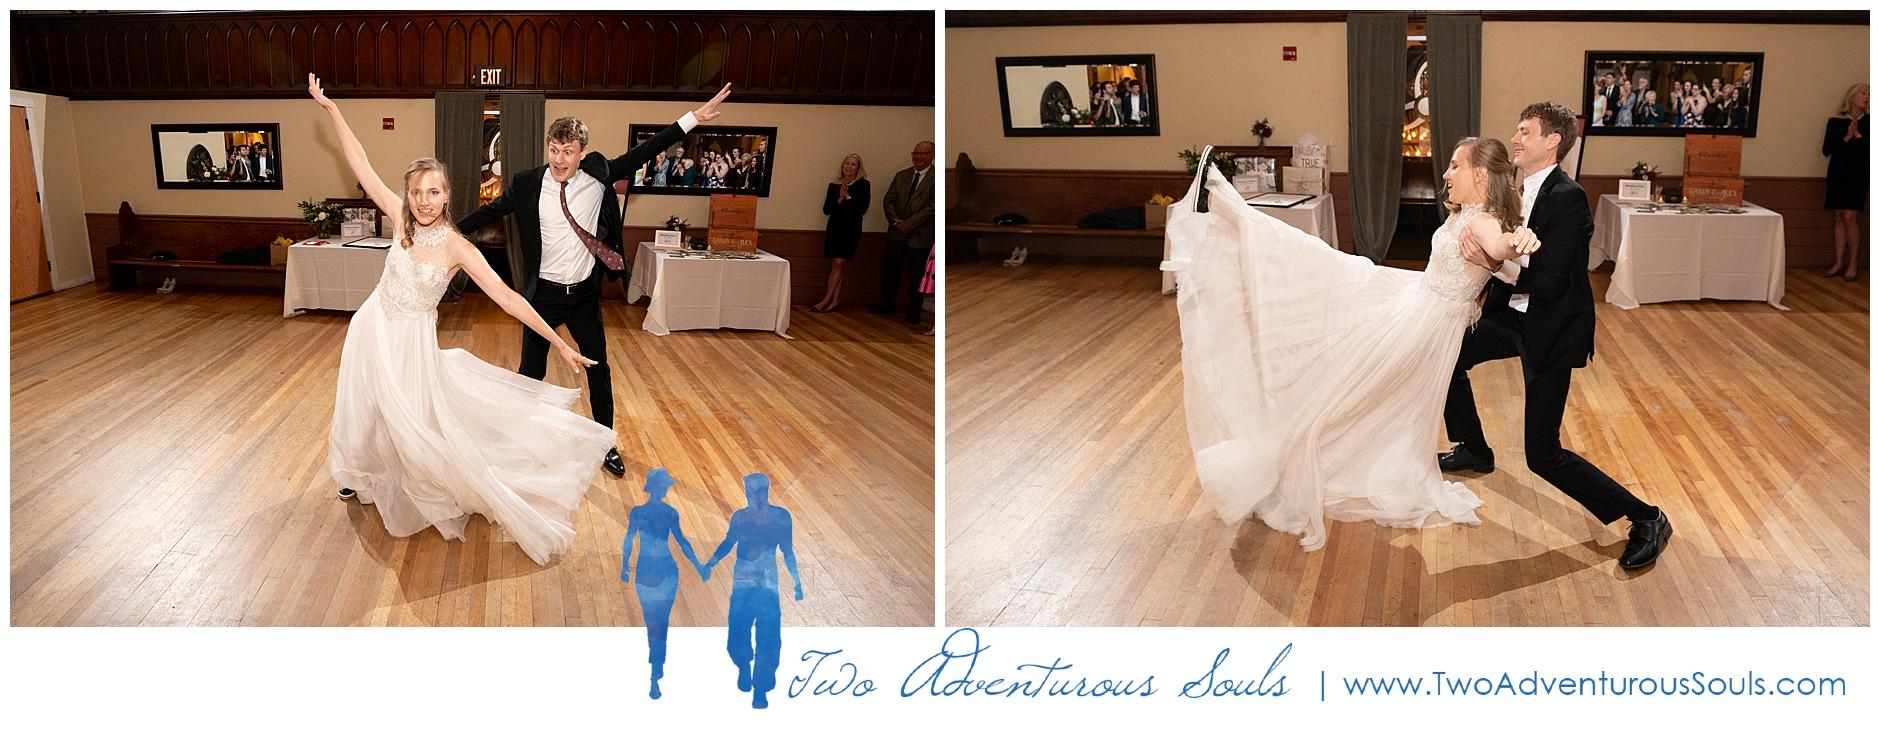 Grace Maine Photographers, Portland Maine Wedding Photographers, Two Adventurous Souls- 090719_0036.jpg